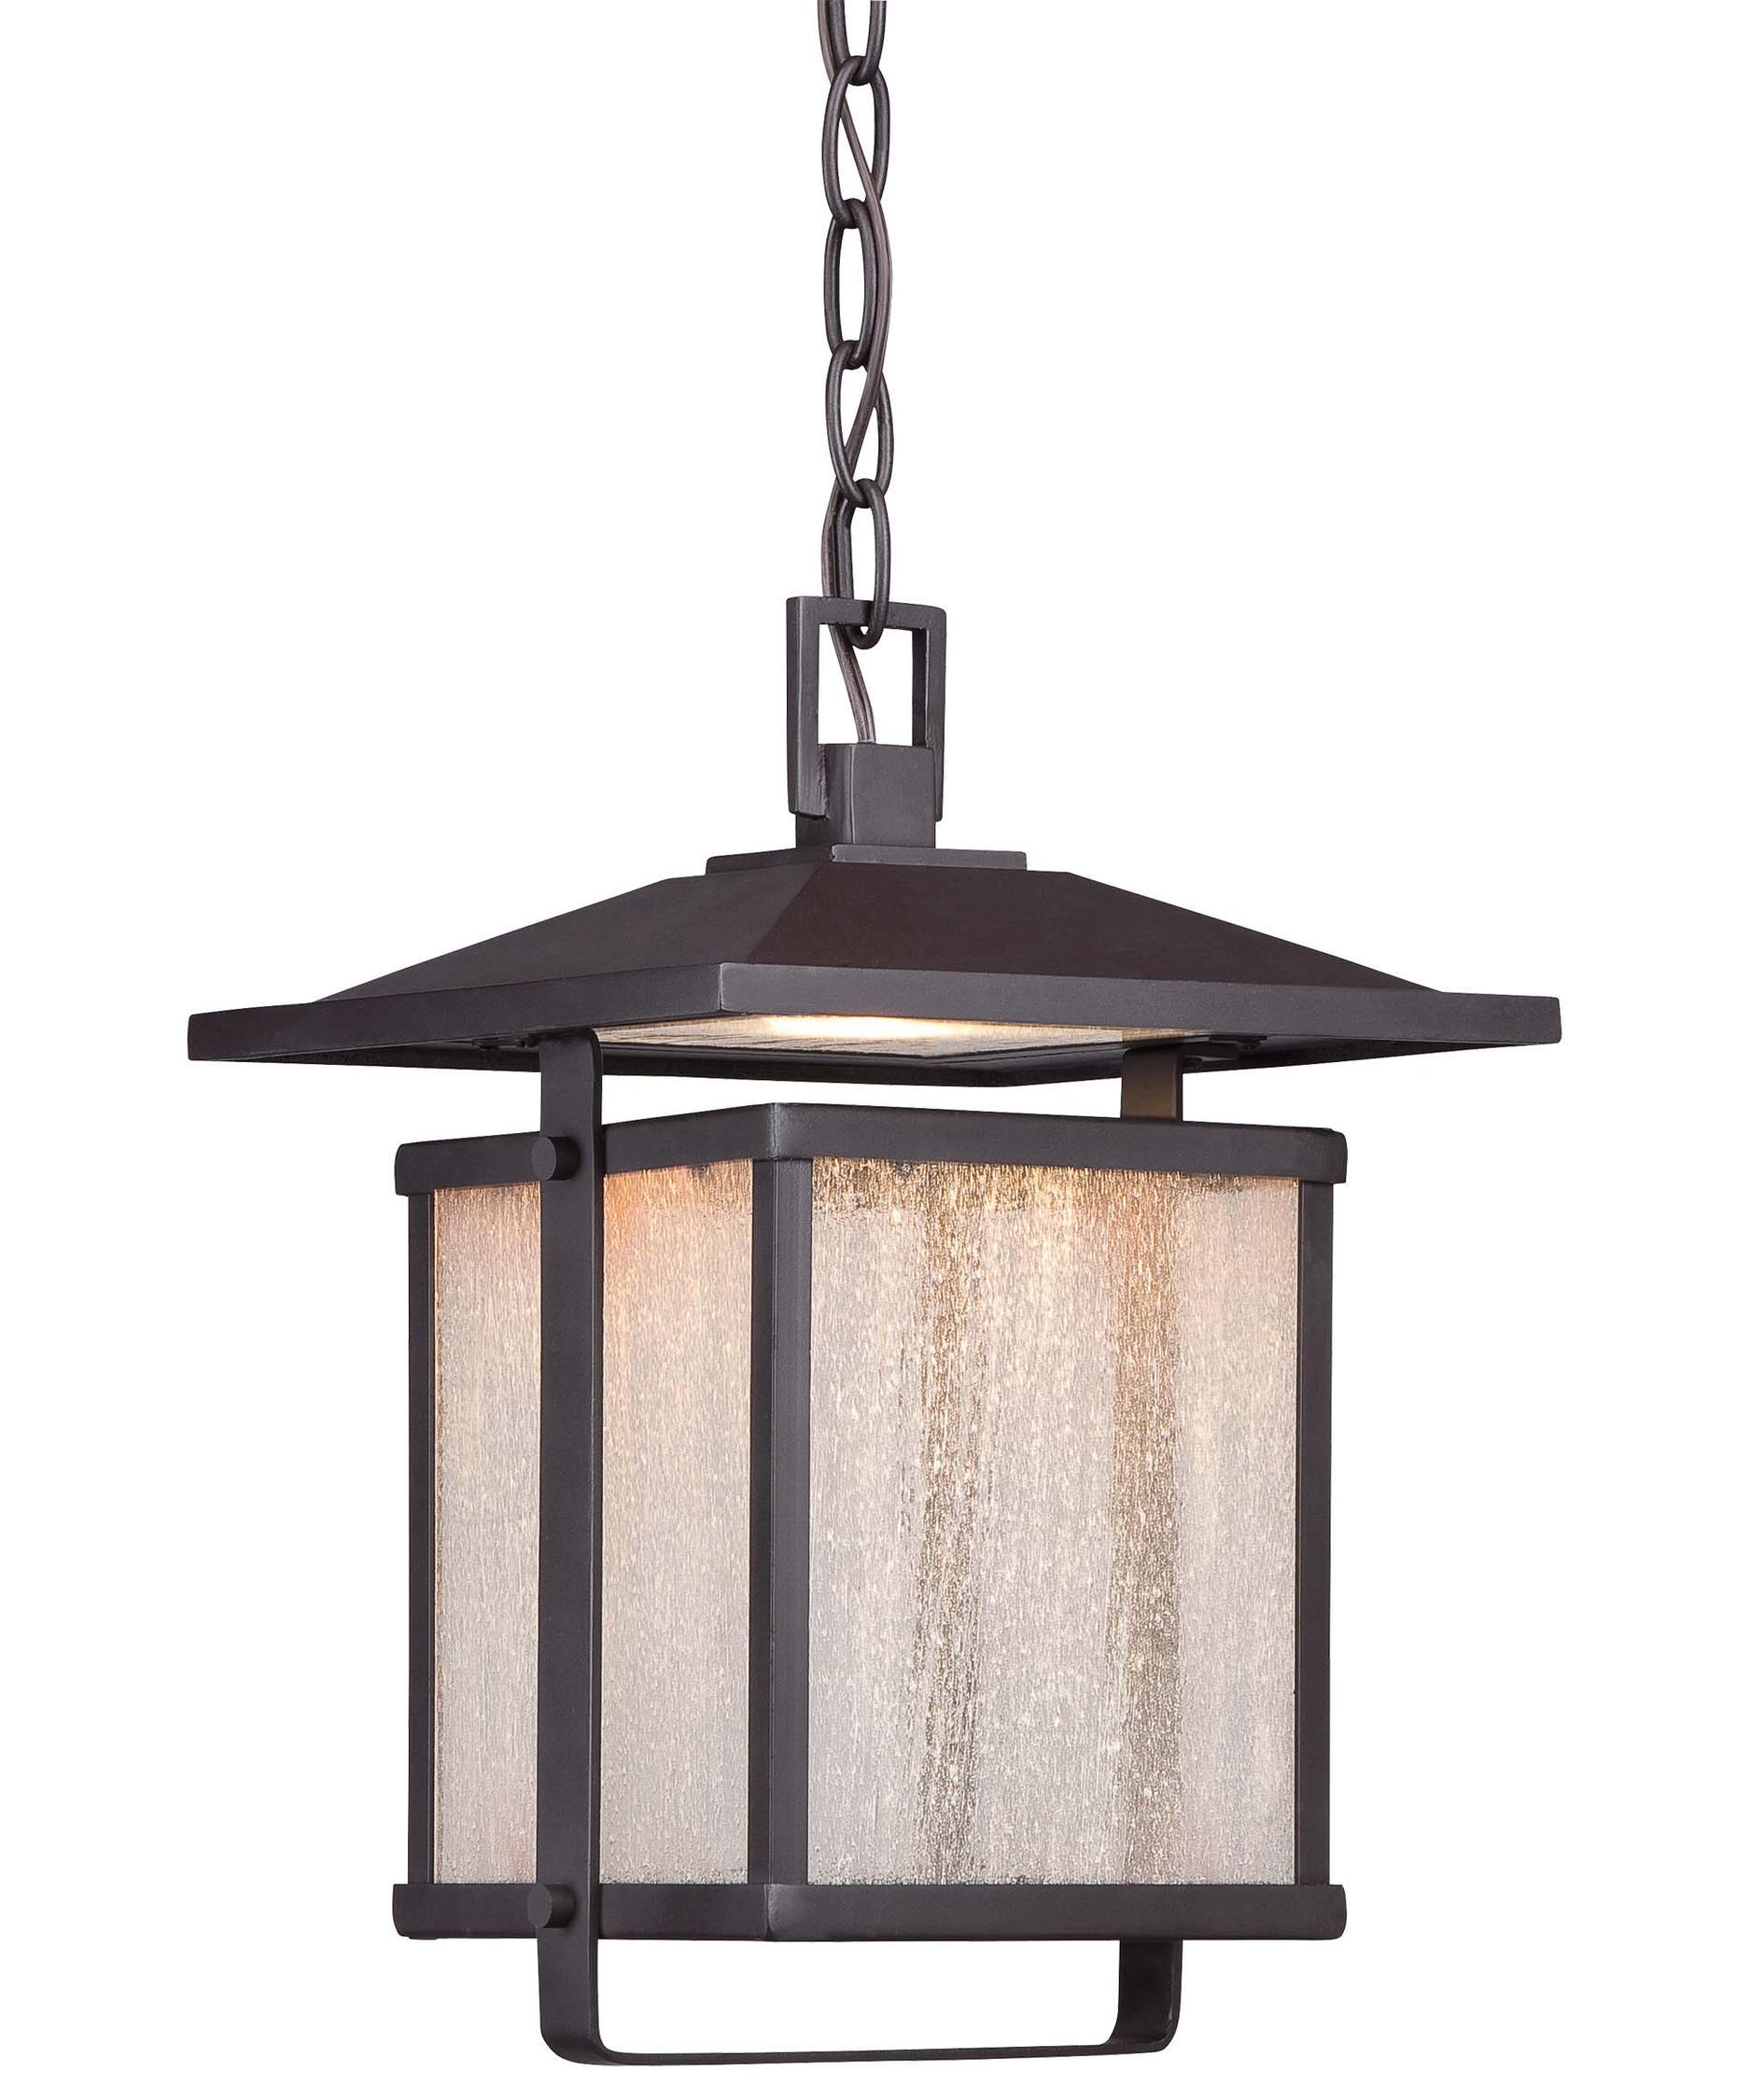 Outdoor hanging lamp - Minka Lavery 8164 Hillsdale 9 Inch Wide 1 Light Outdoor Hanging Lantern Capitol Lighting 1 800lighting Com